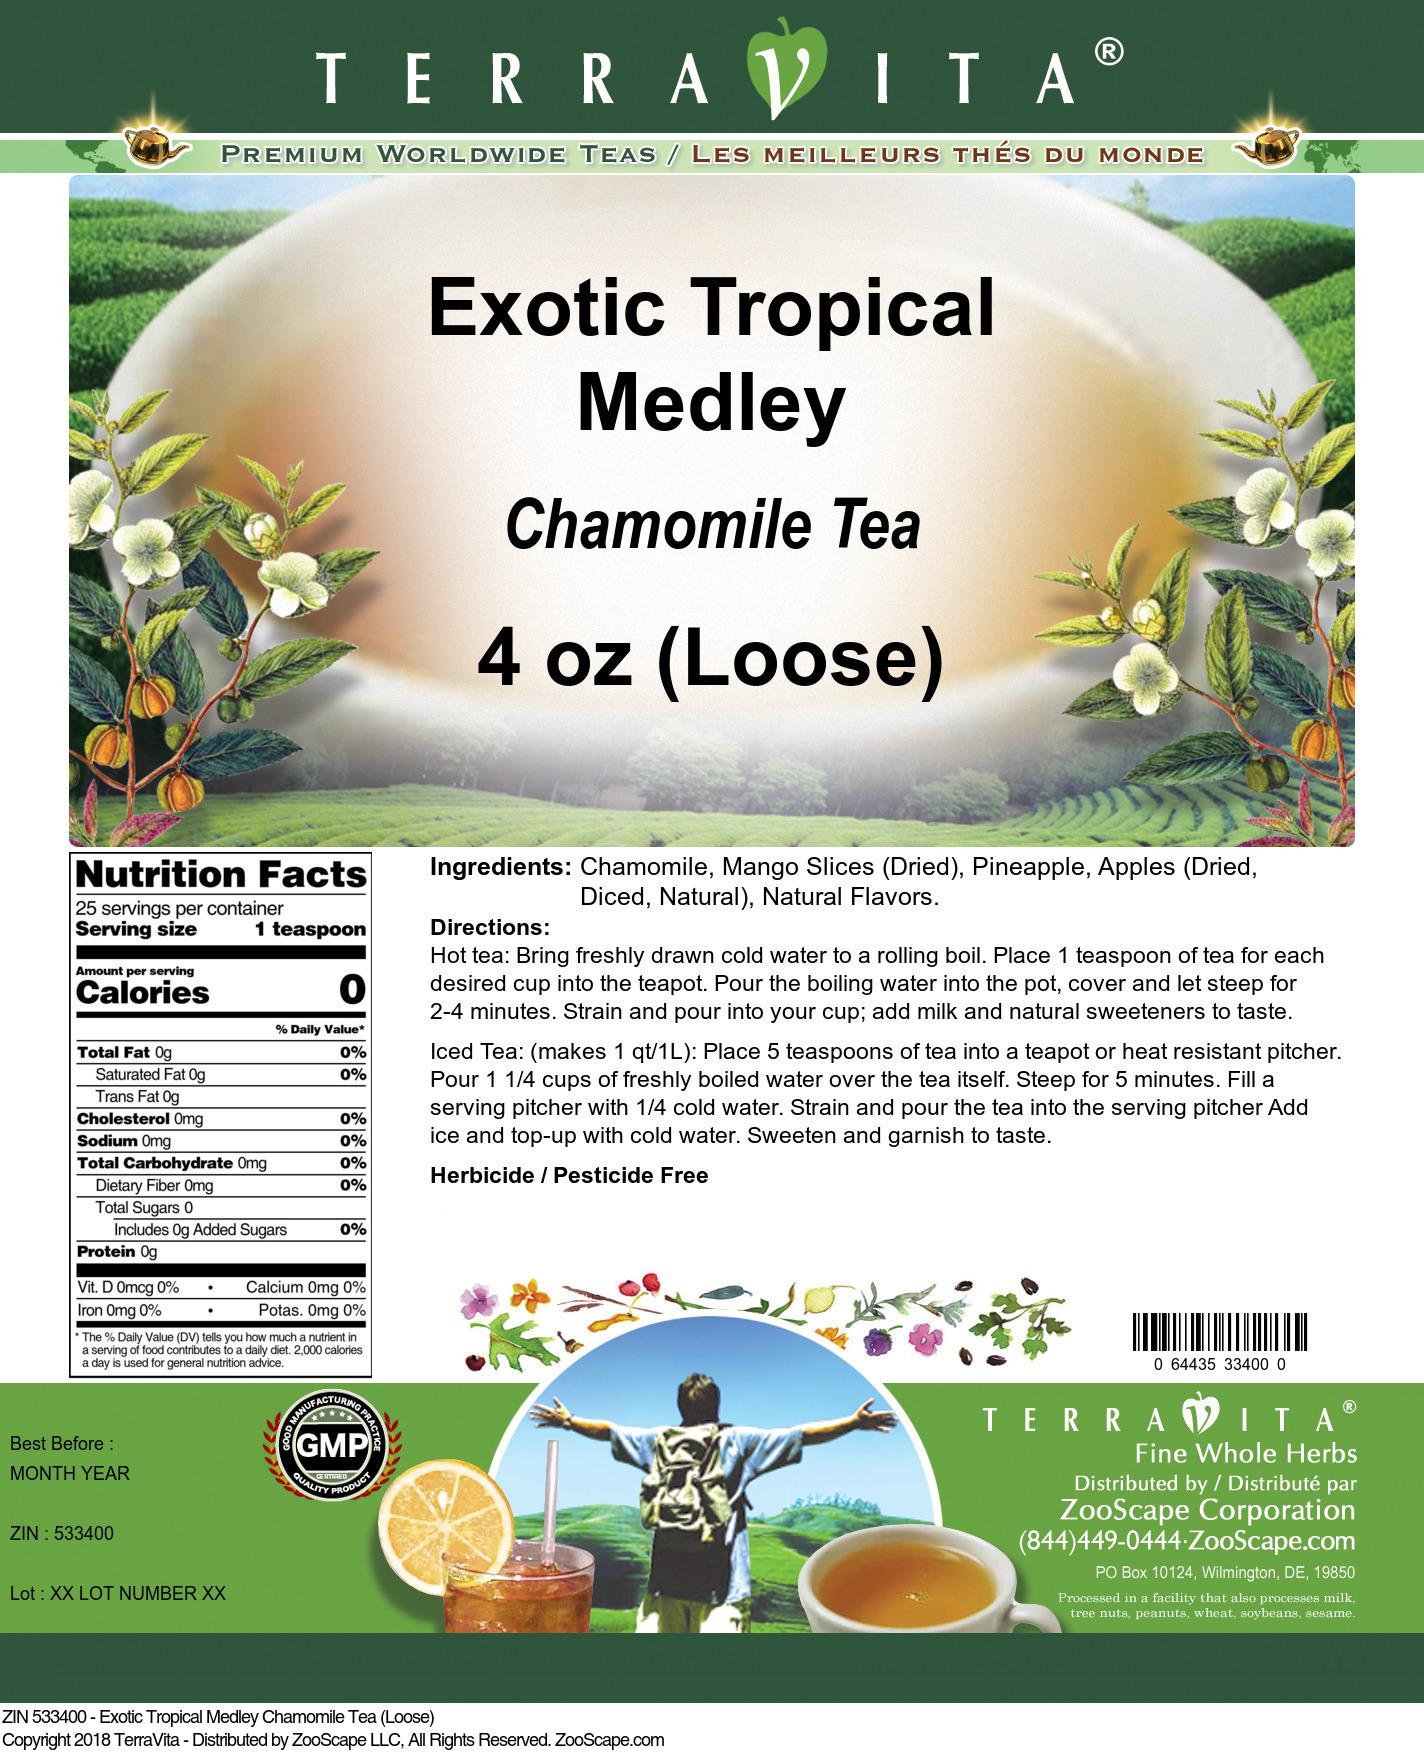 Exotic Tropical Medley Chamomile Tea (Loose)